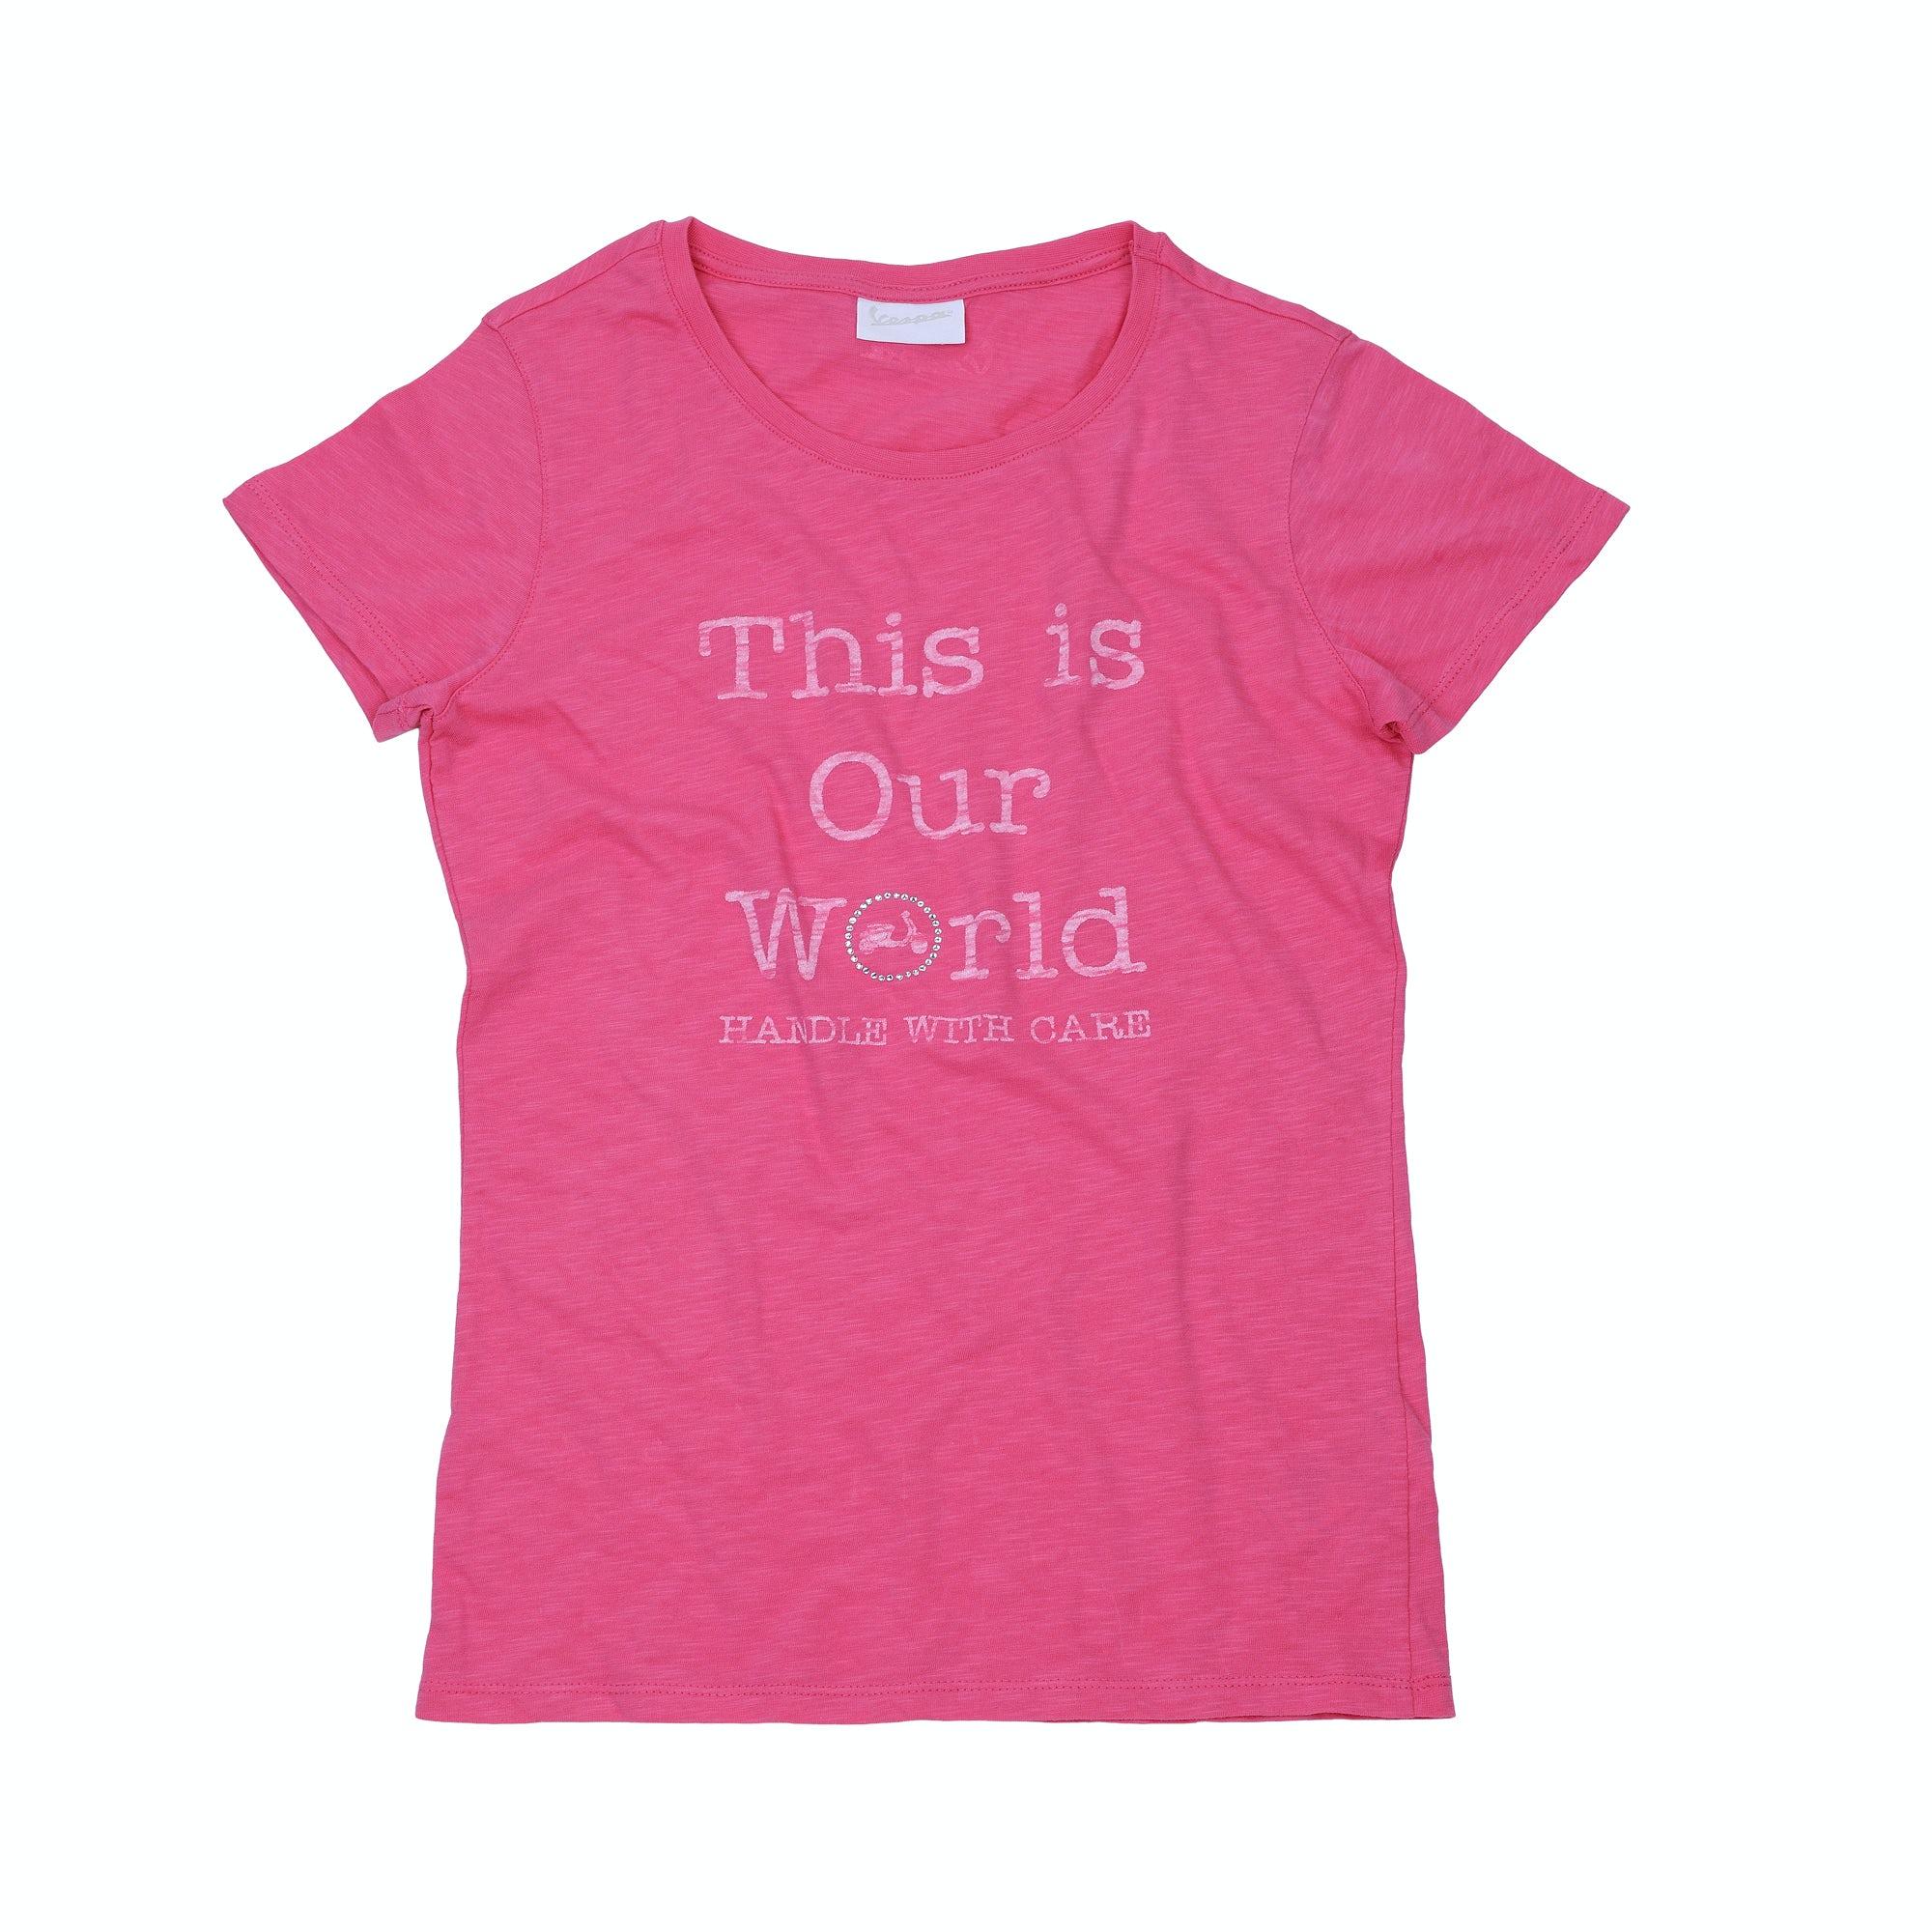 t shirt vespa this our world t shirts abbigliamento. Black Bedroom Furniture Sets. Home Design Ideas